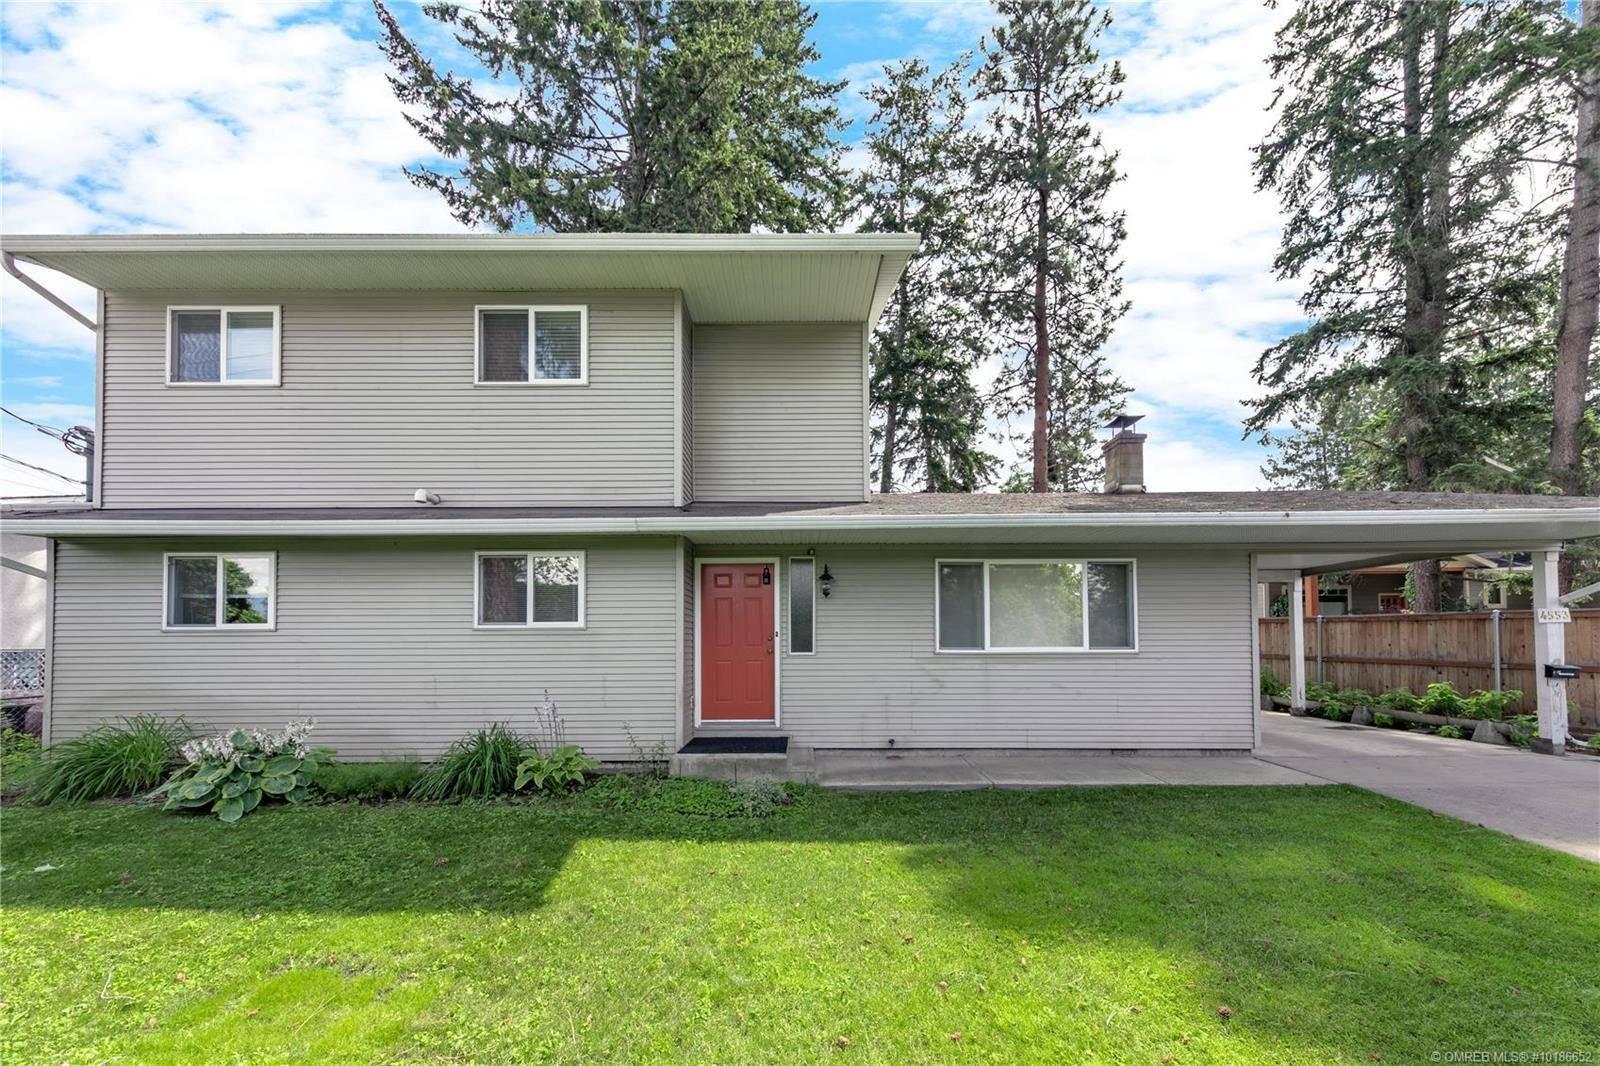 House for sale at 4553 Gordon Dr Kelowna British Columbia - MLS: 10186652